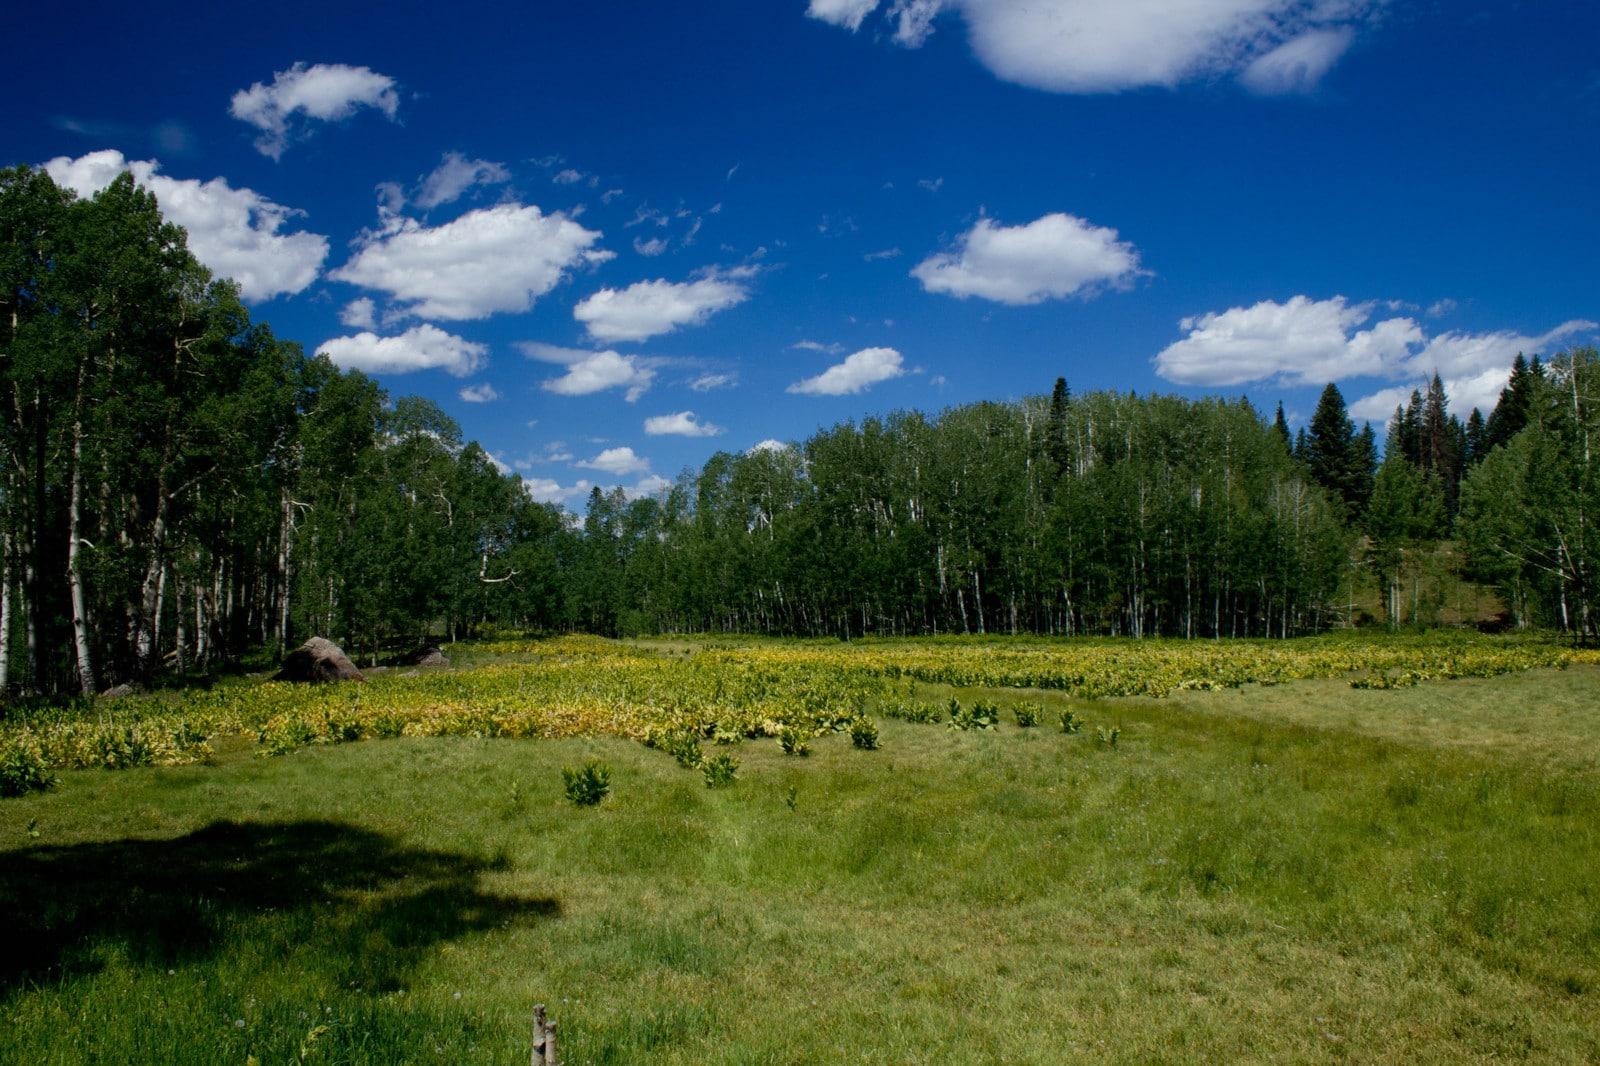 Image of Deb's Meadow in Owl Creek Pass in Ridgway, Colorado